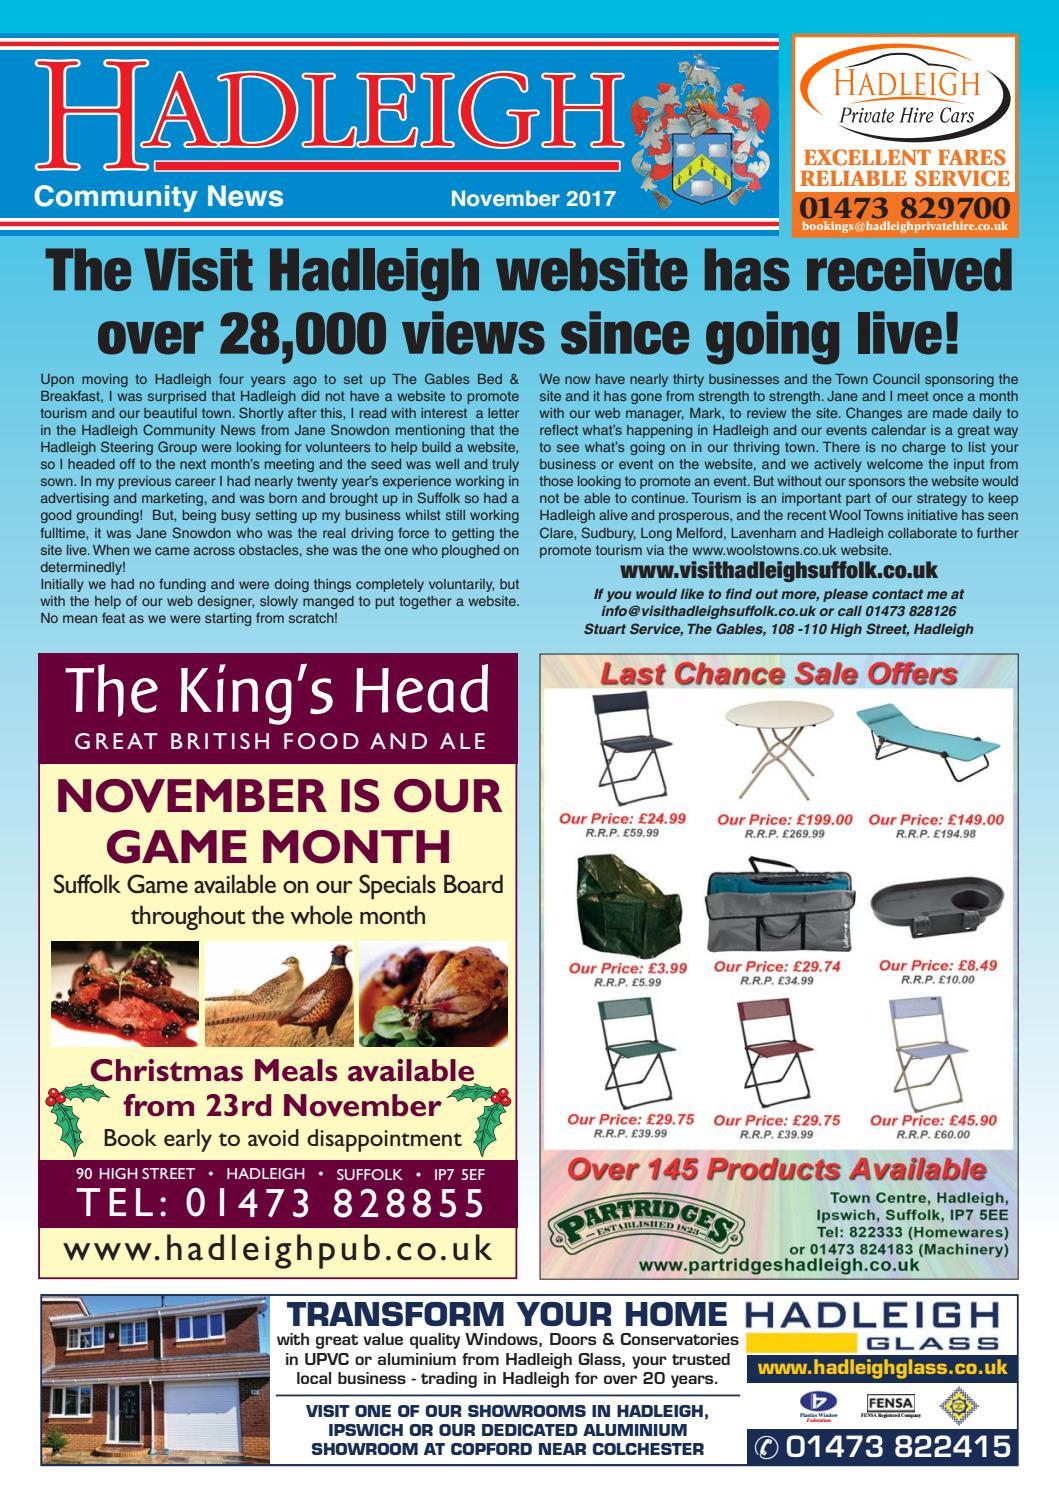 Hadleigh community news november 2017 by keith avis printers issuu fandeluxe Choice Image